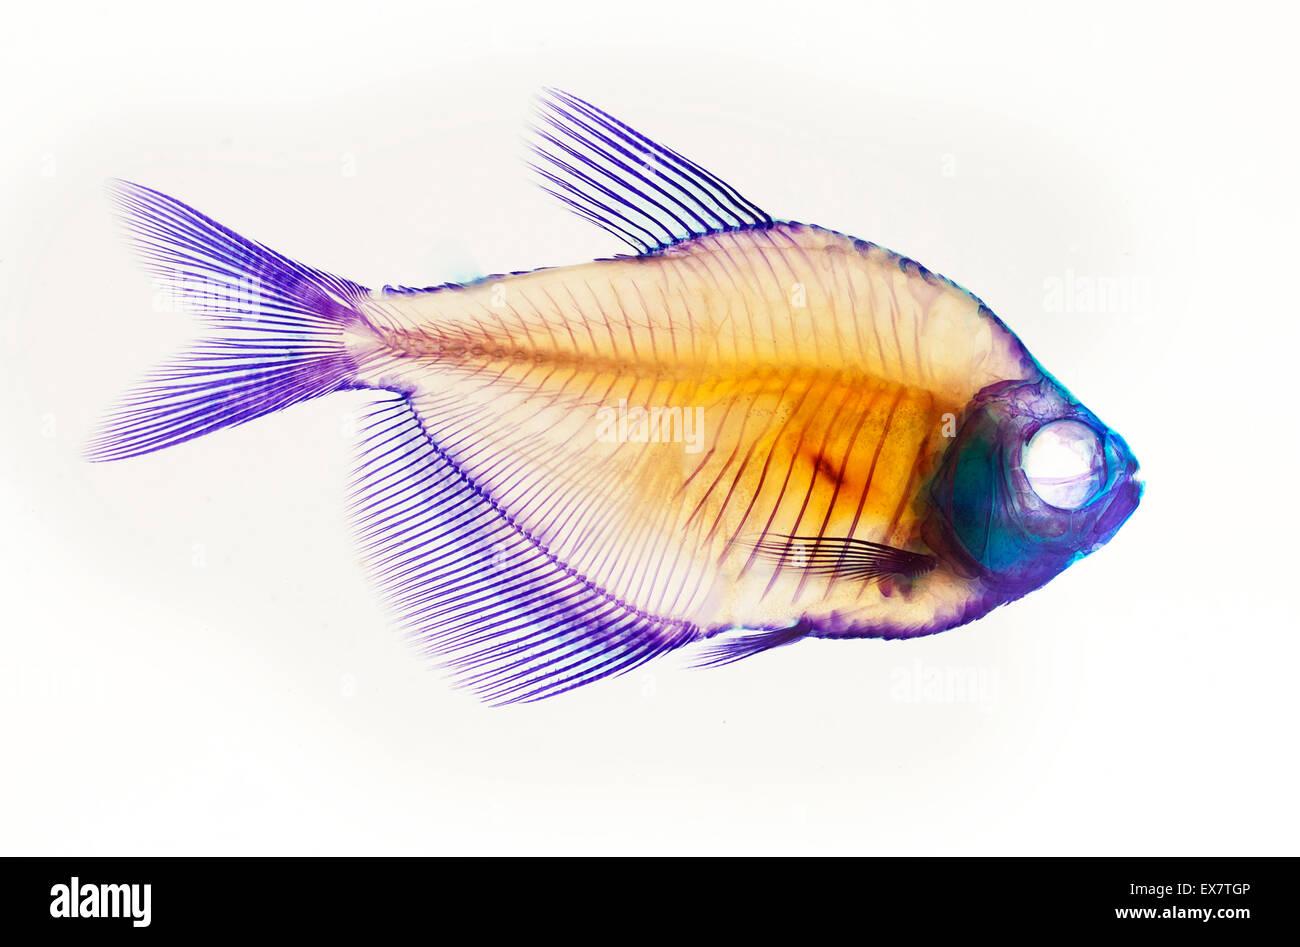 Fisch Skelett Anatomie Stockfoto, Bild: 84995478 - Alamy